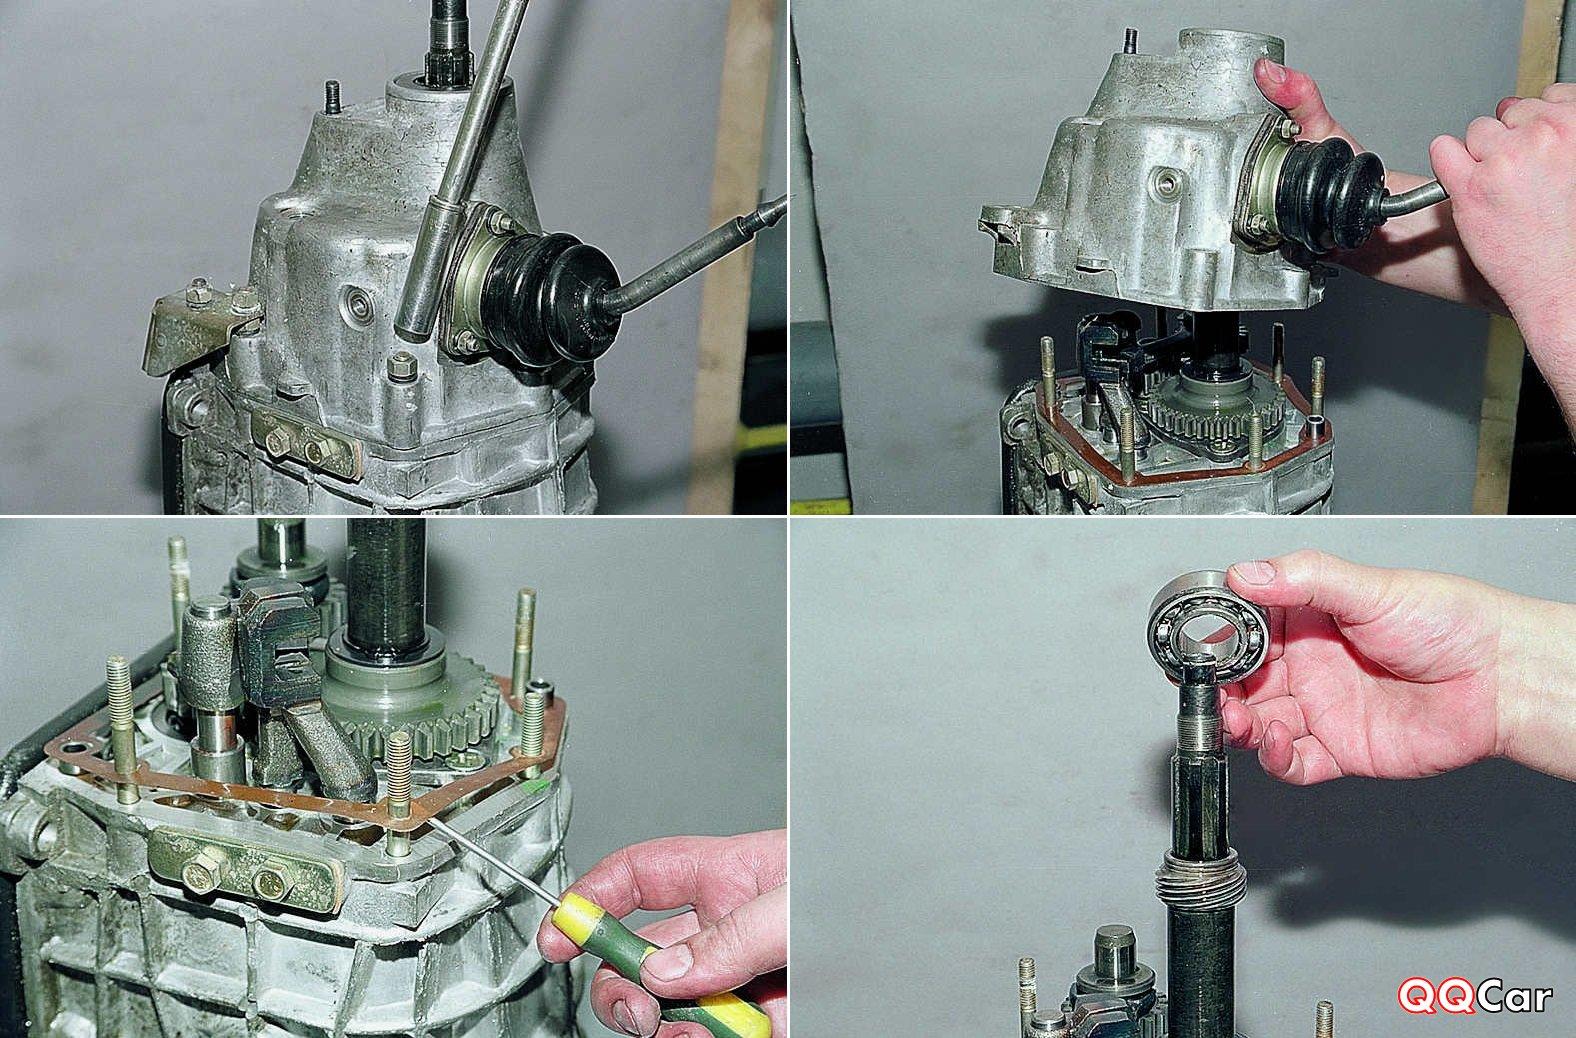 Ремонт коробки передач ваз 2107 - разборка и сборка